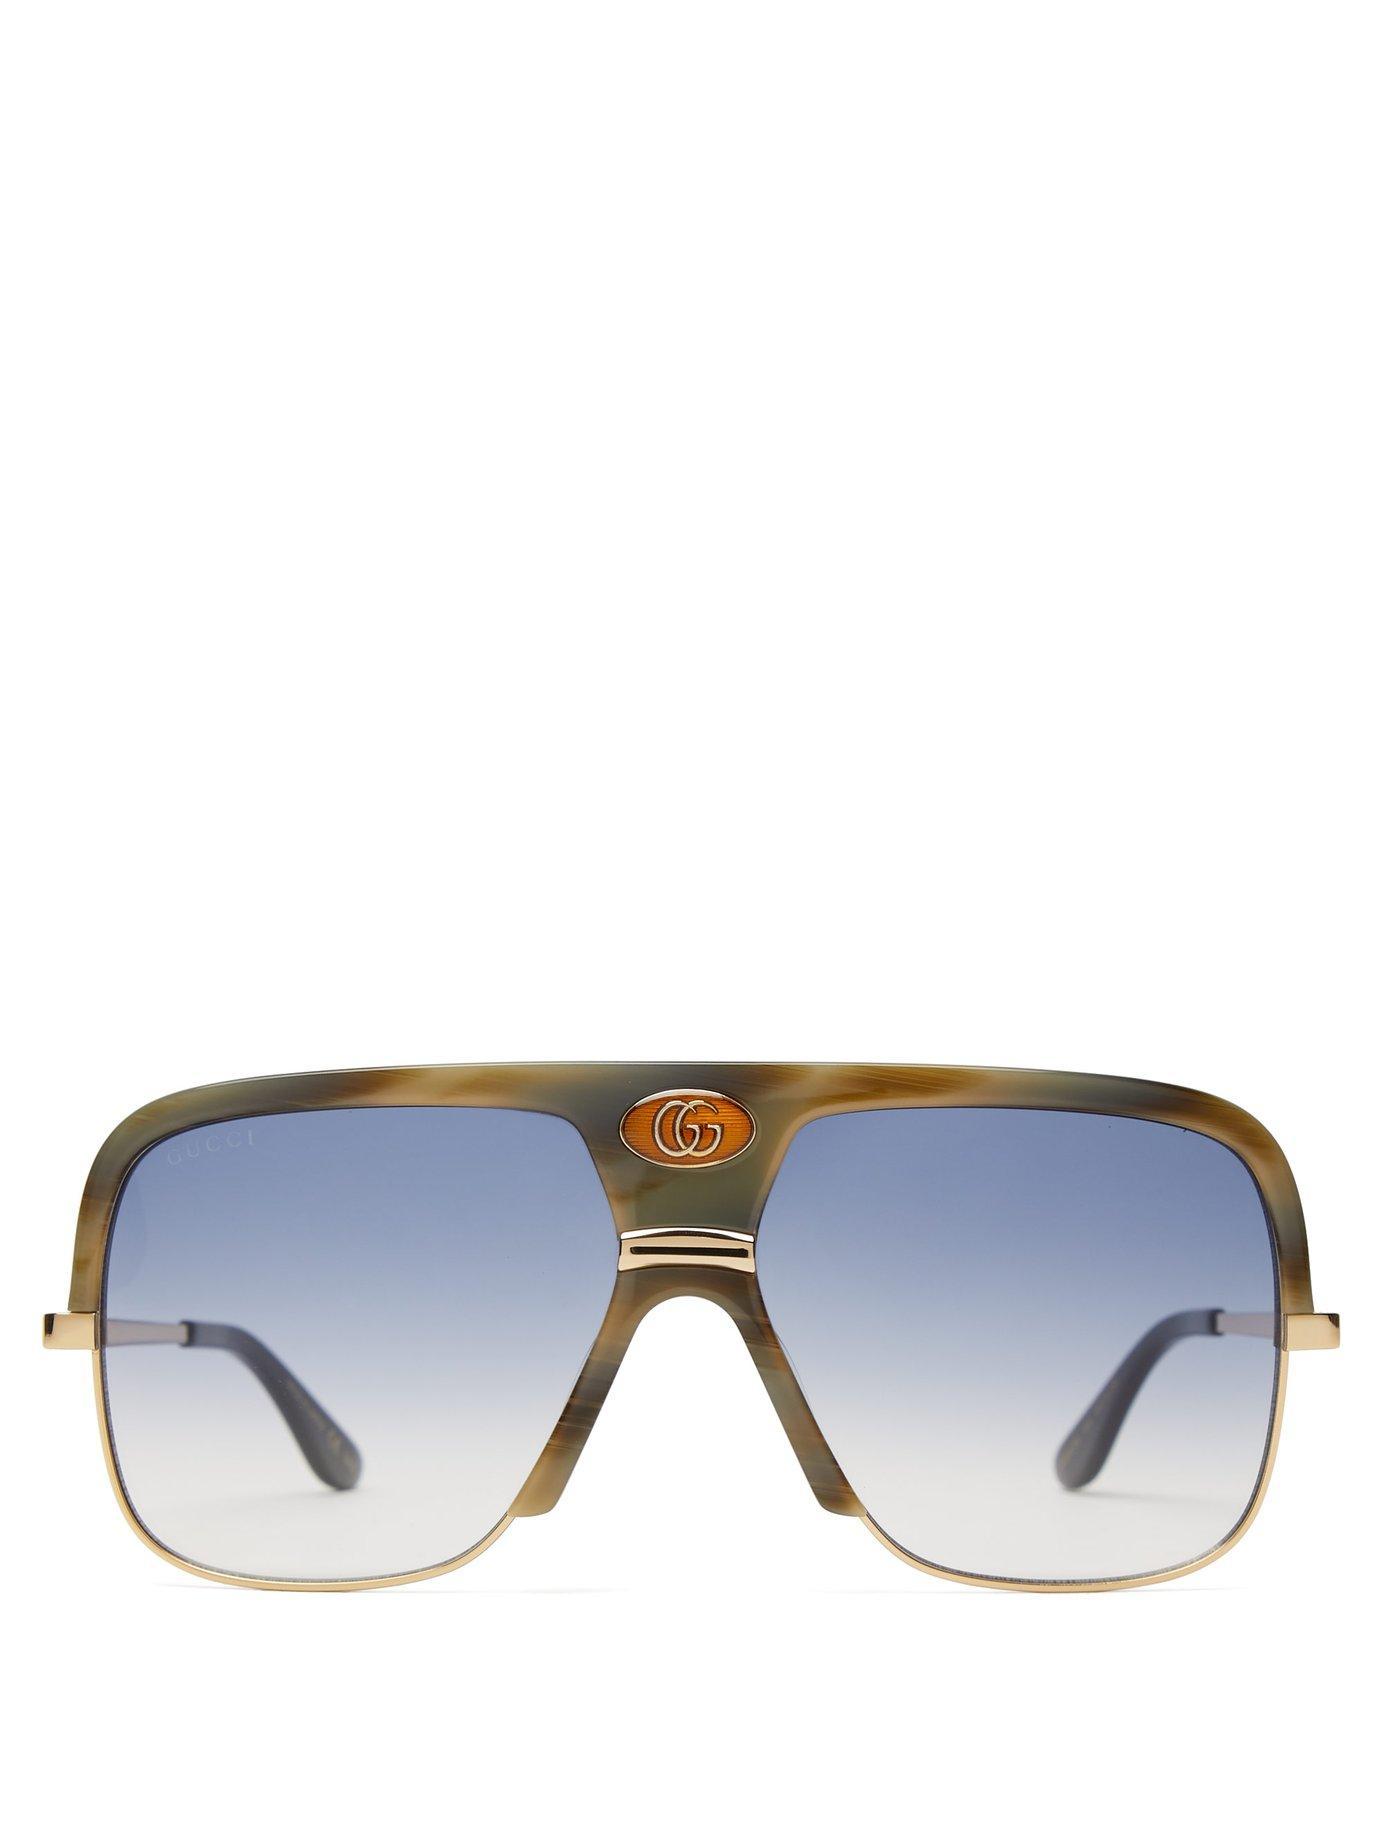 fa932373abf Lyst - Gucci Navigator Acetate And Metal Sunglasses in Green for Men